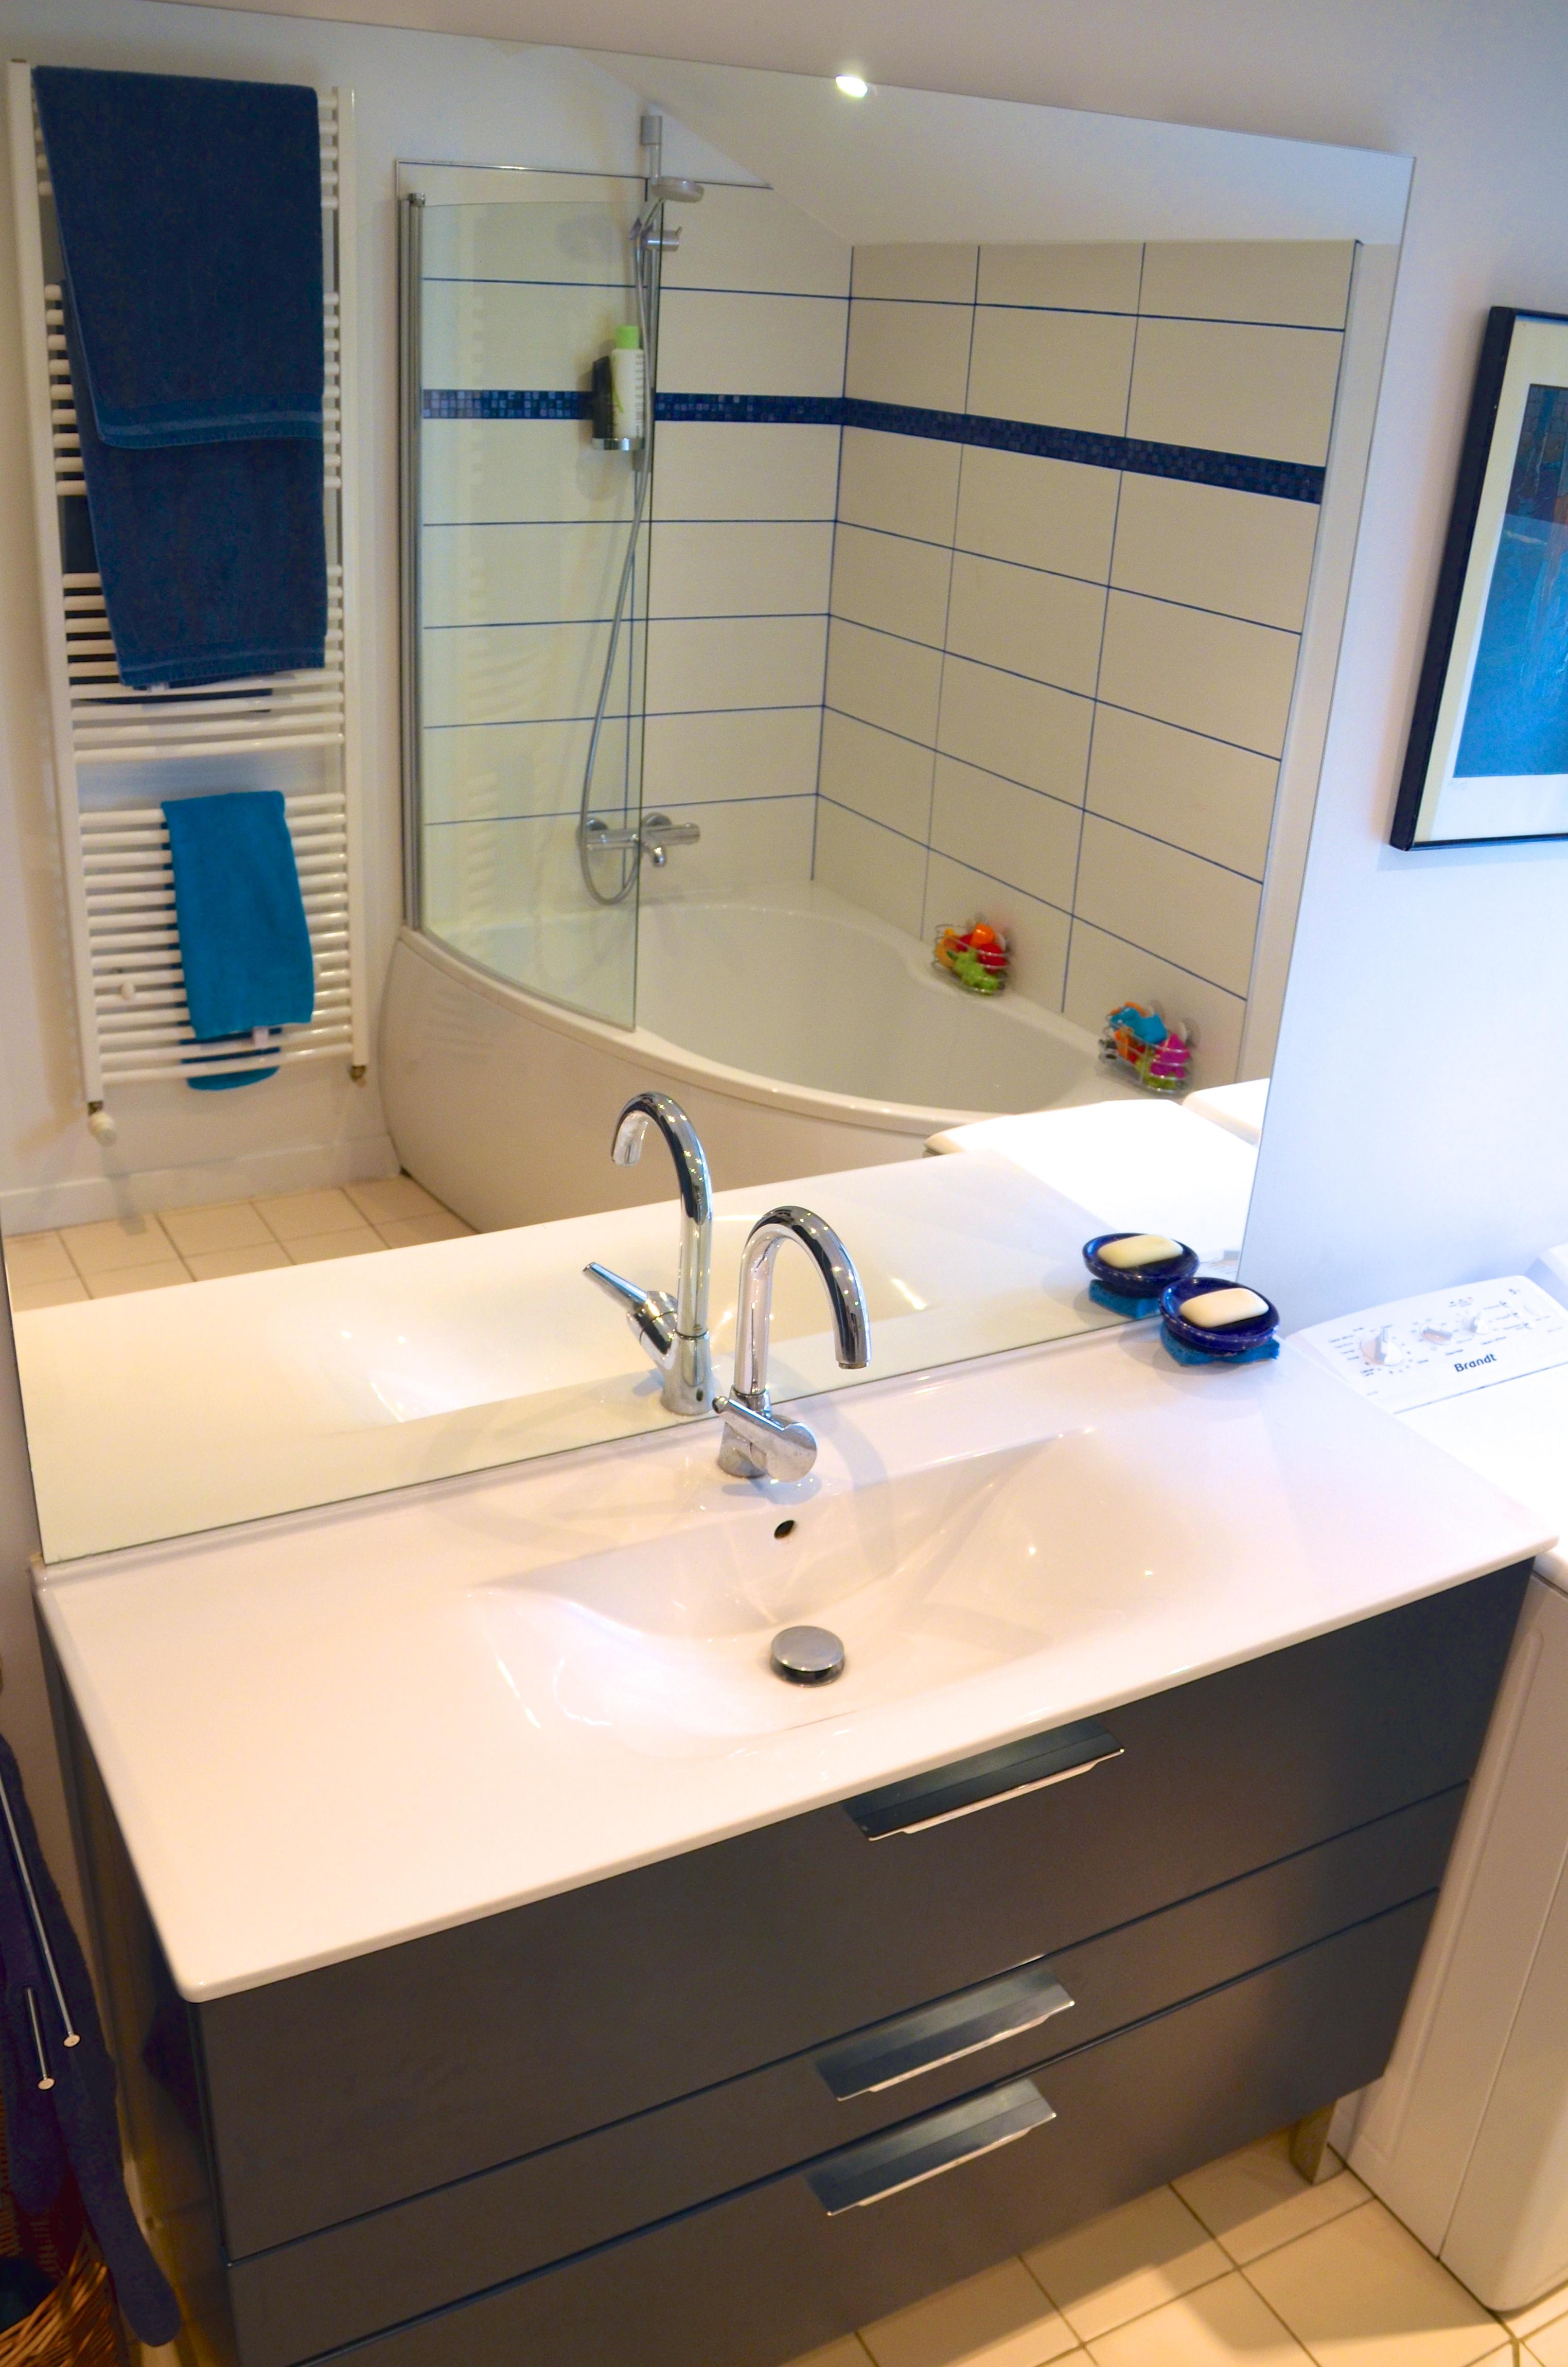 renovation baignoire good peinture baignoire prix rnovation baignoire fonte maille prix. Black Bedroom Furniture Sets. Home Design Ideas